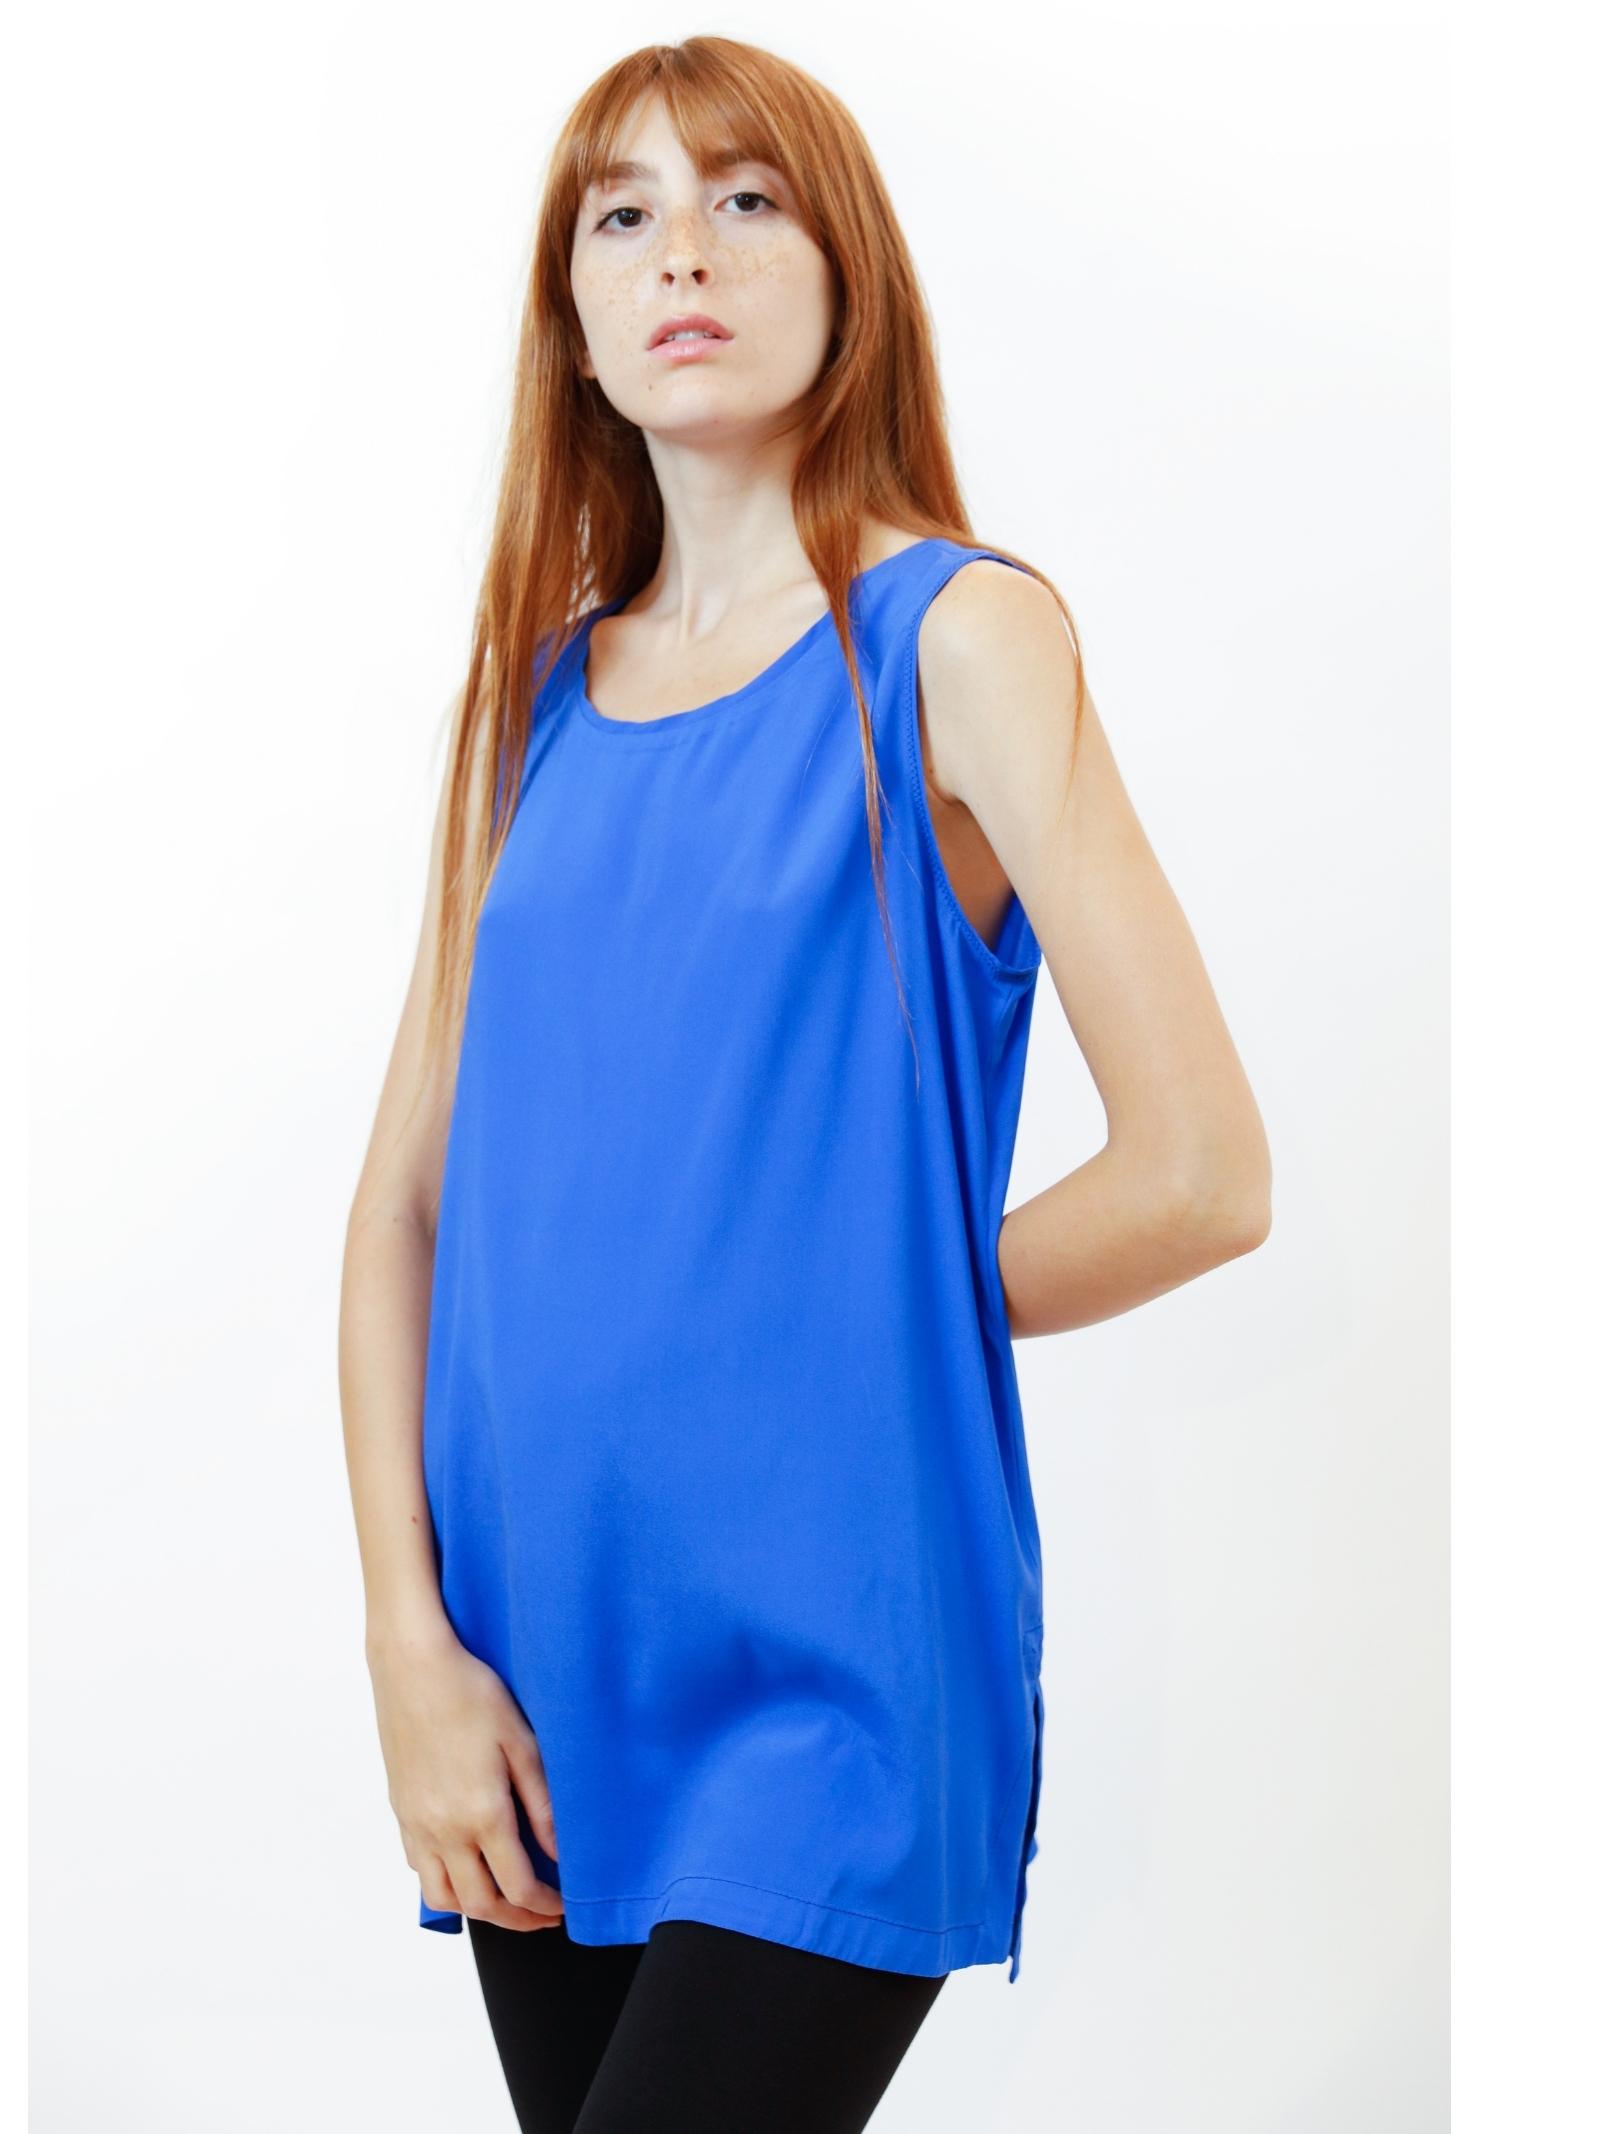 Women's Clothing Silk Satin Top in Cobalt Pure Silk Maliparmi   Shirts and tops   JP50793102080059